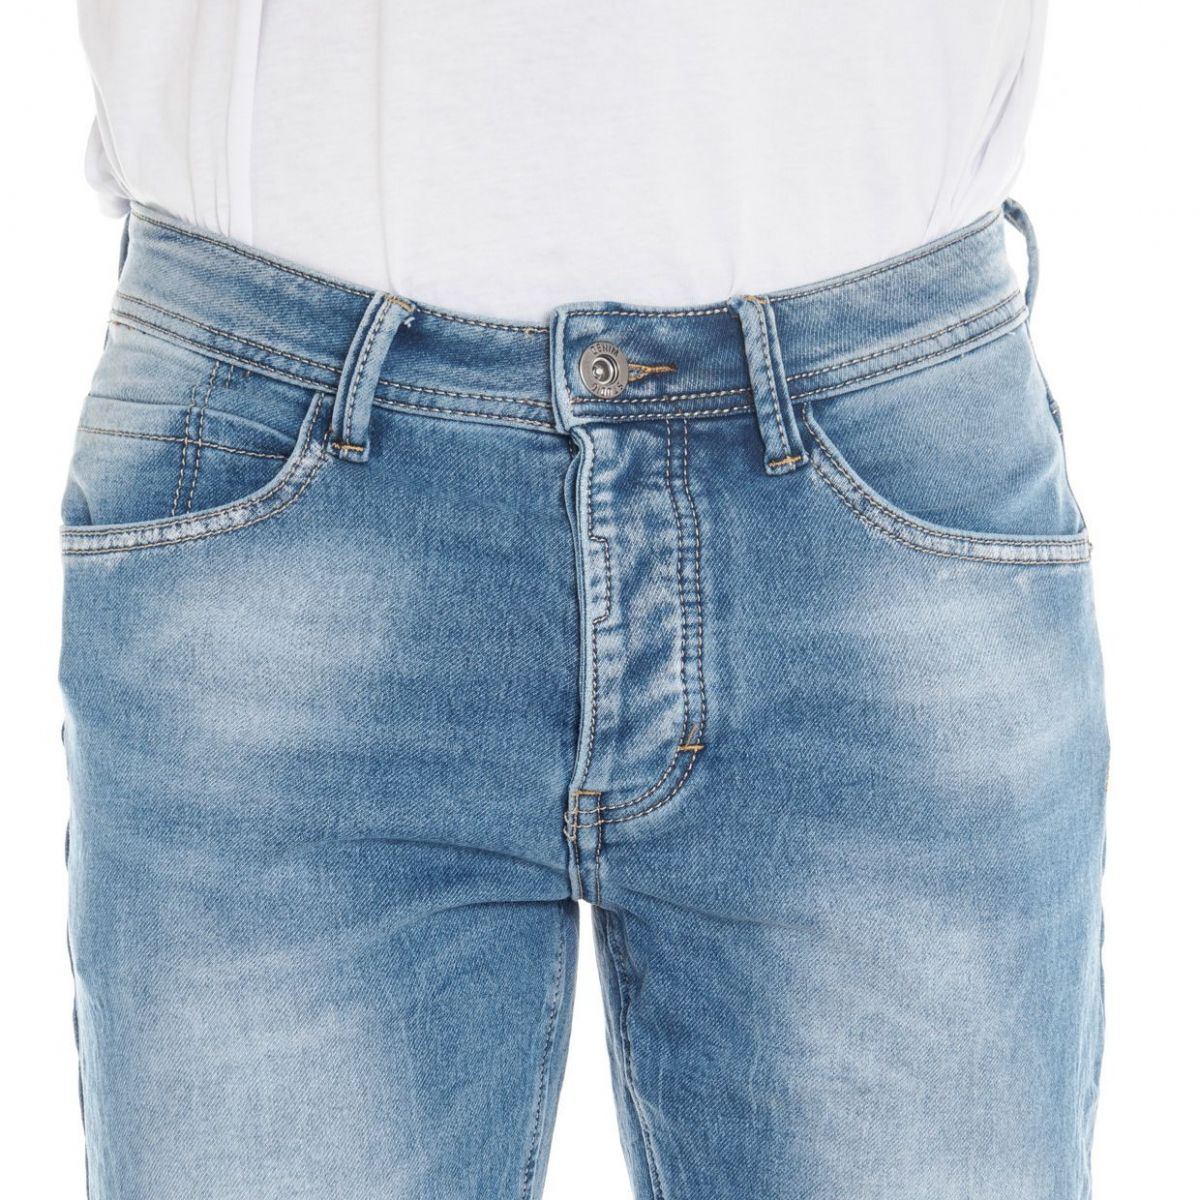 sconti abbigliamento uomo Bermuda LPHM1063 BLU Cafedelmar Shop